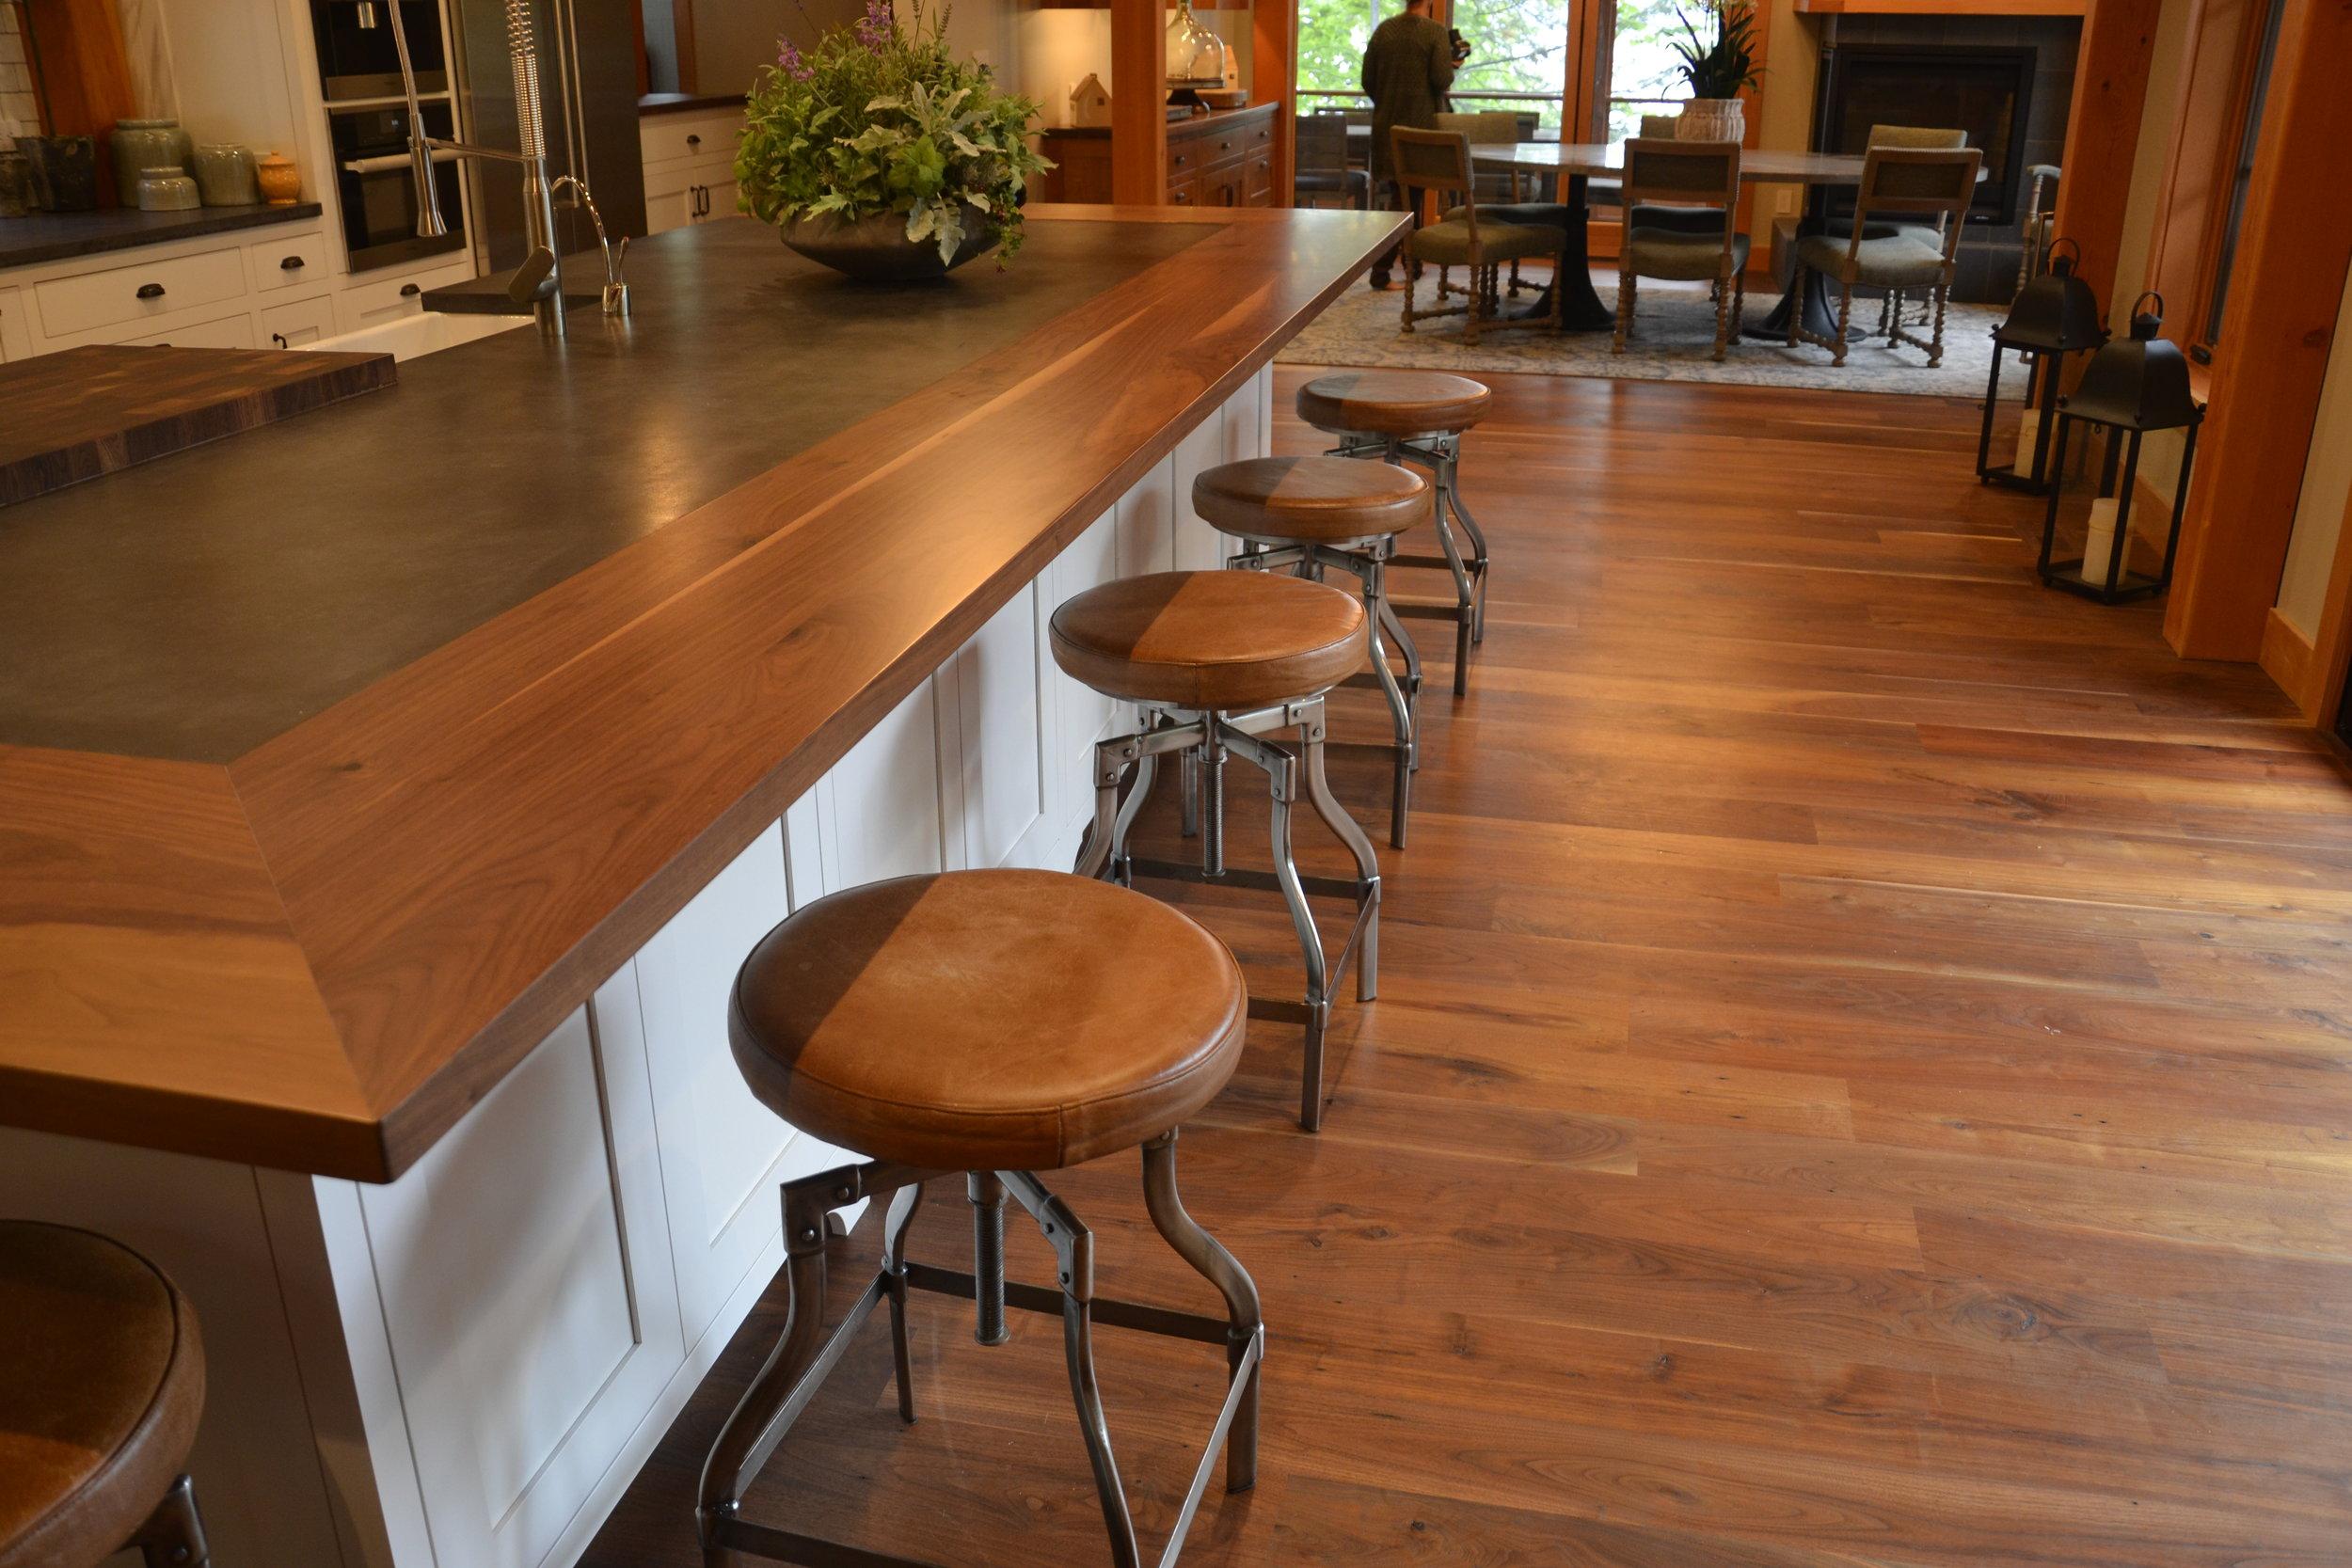 Plank Walnut surround counter top